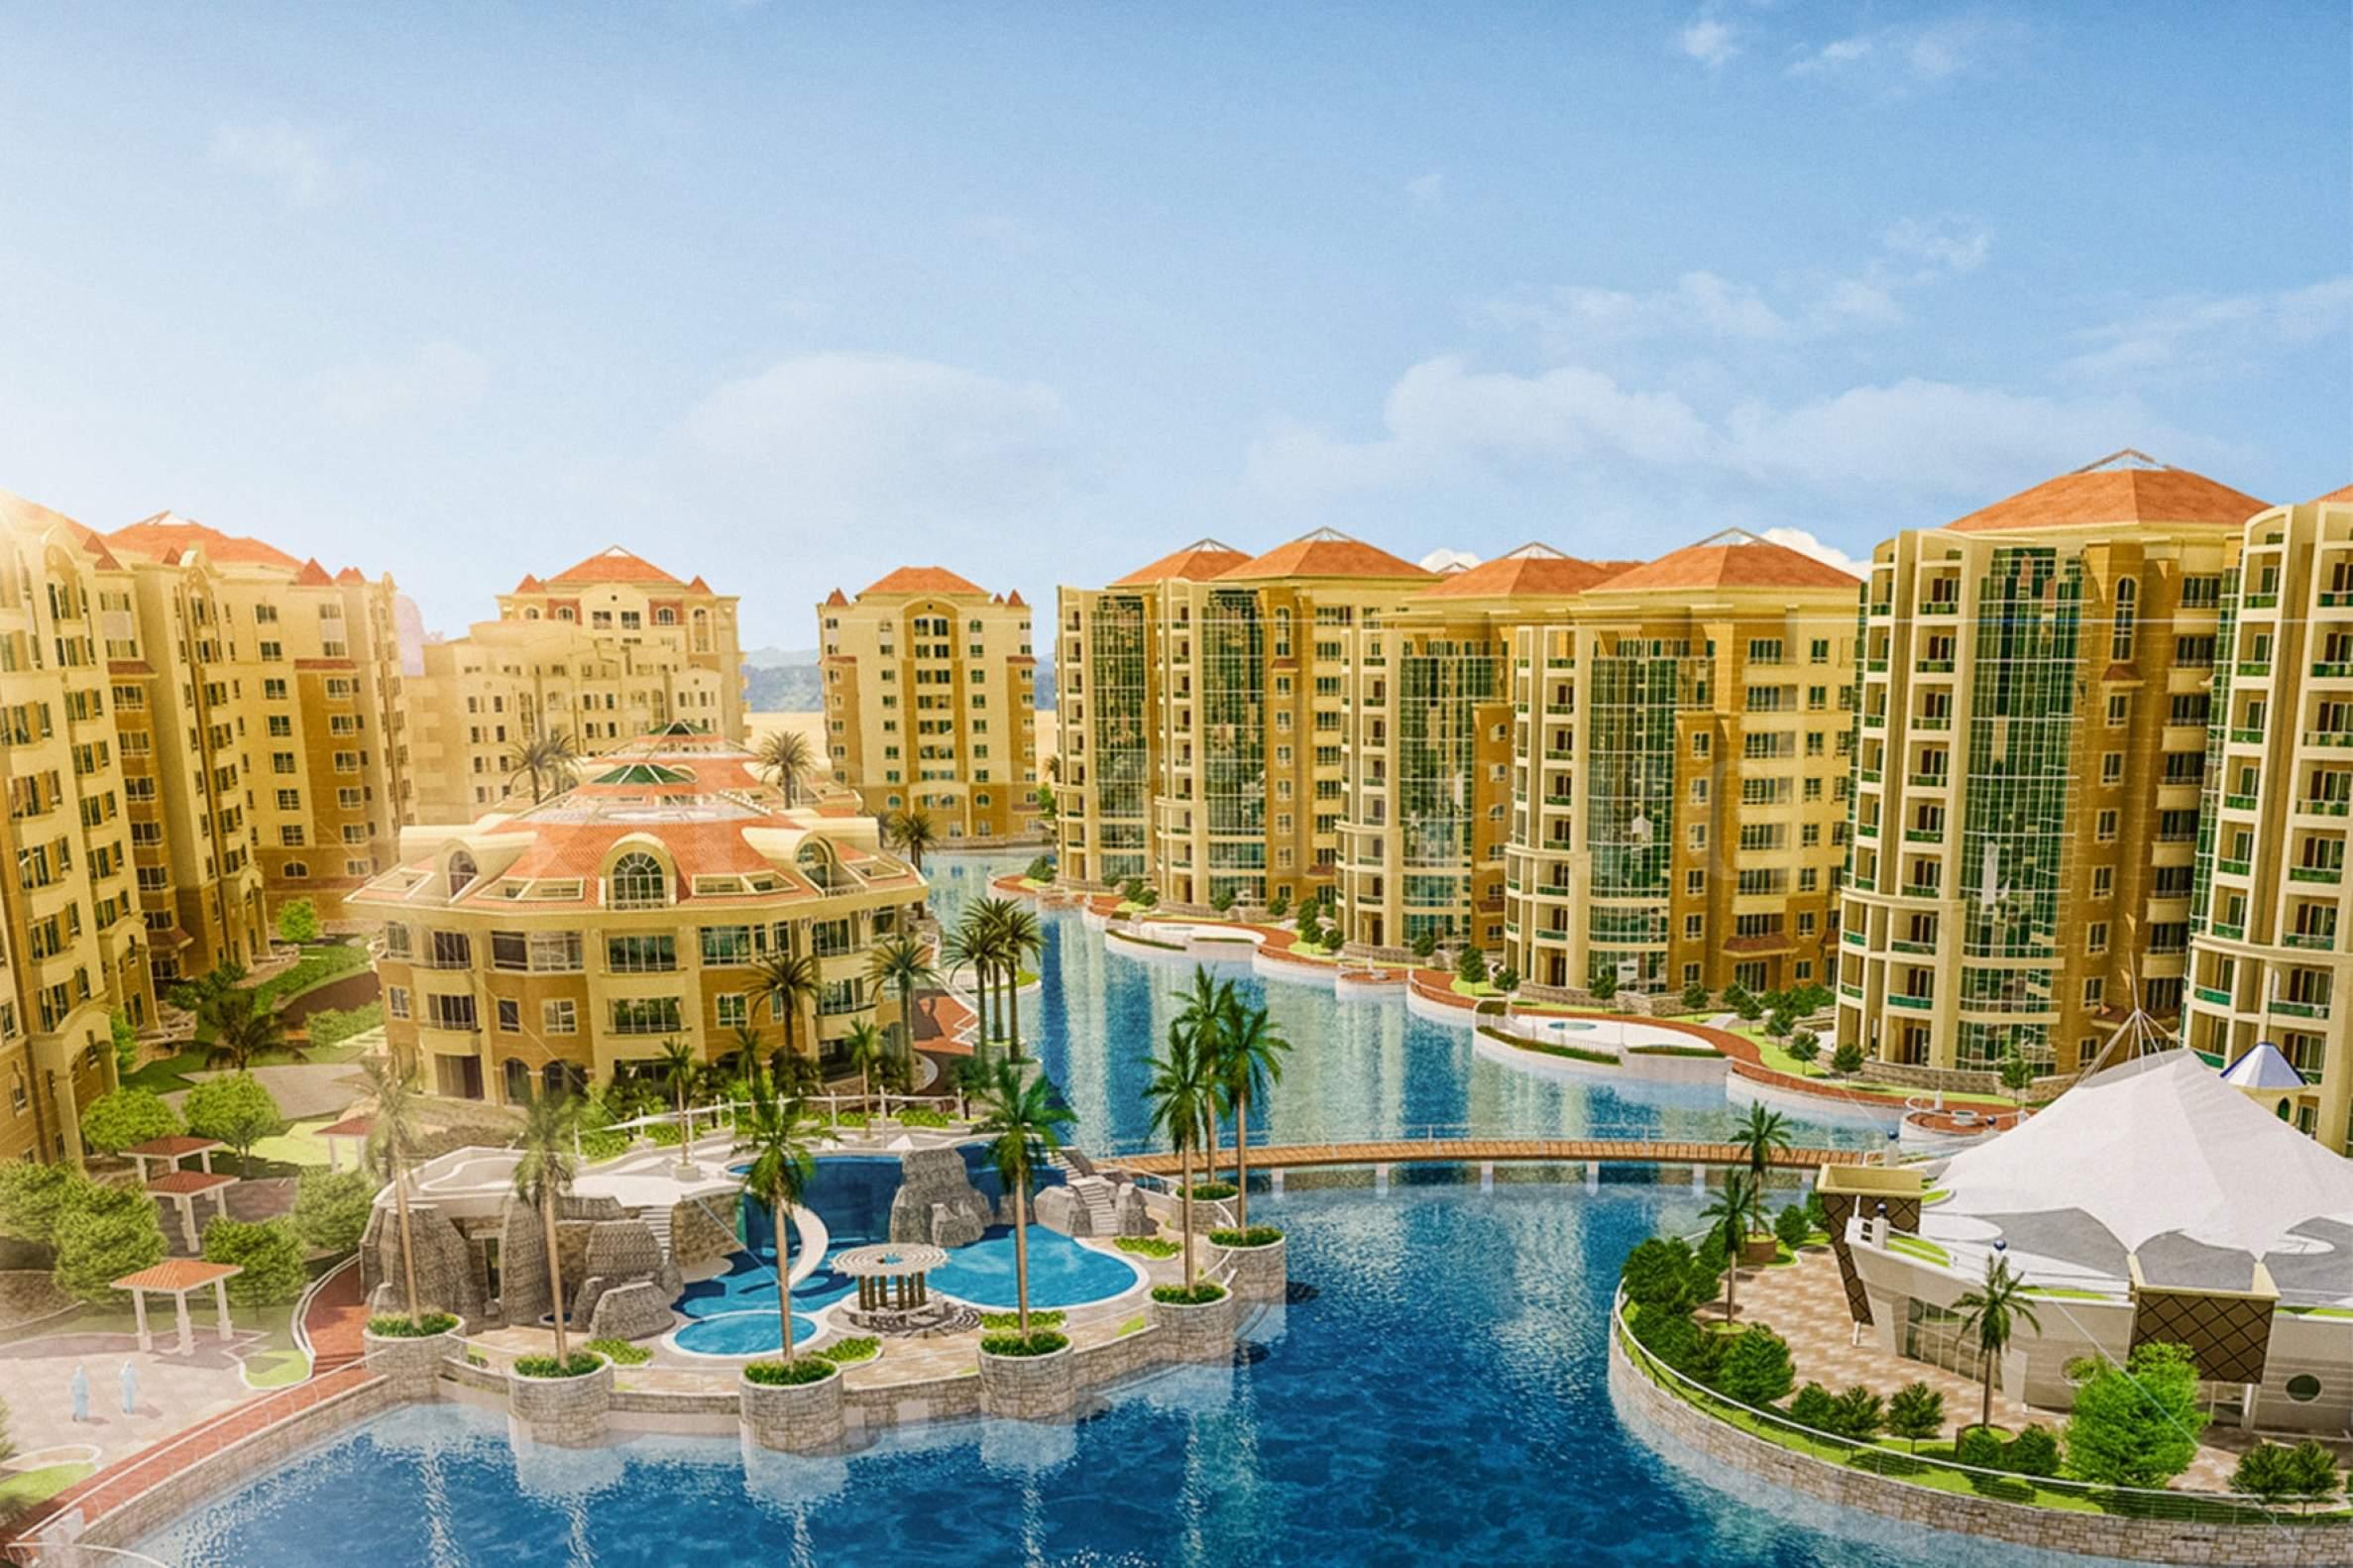 Luxury residential complex near lagoon in Dubai1 - Stonehard